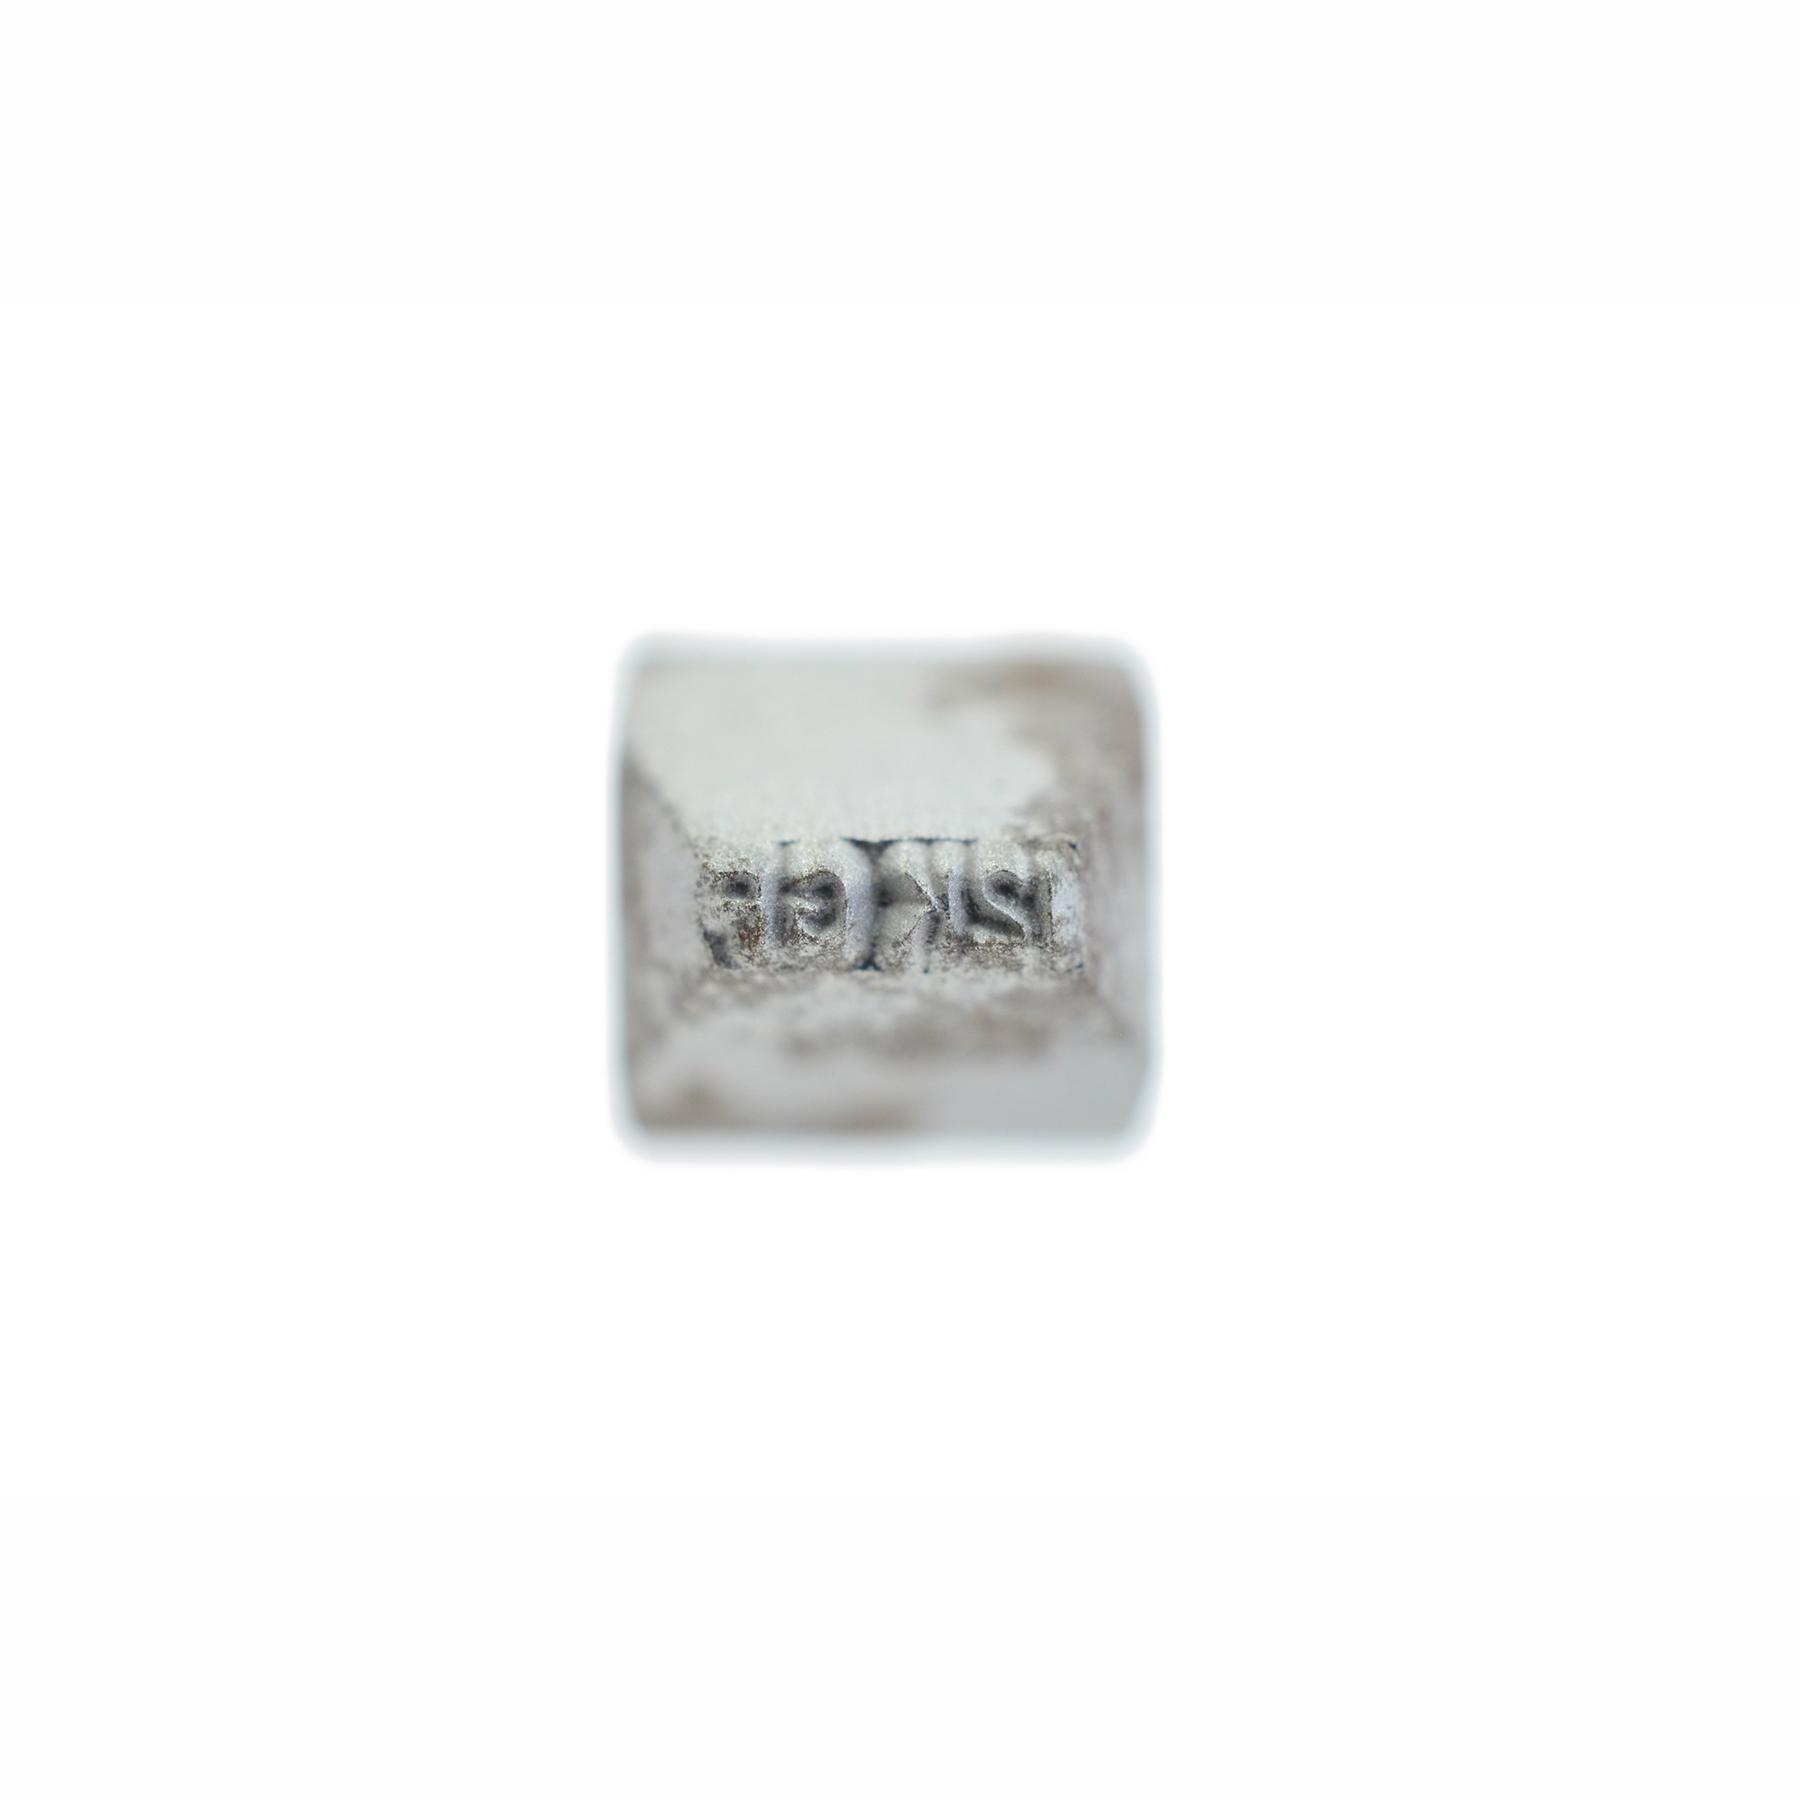 12k GF Straight Hallmark Stamp